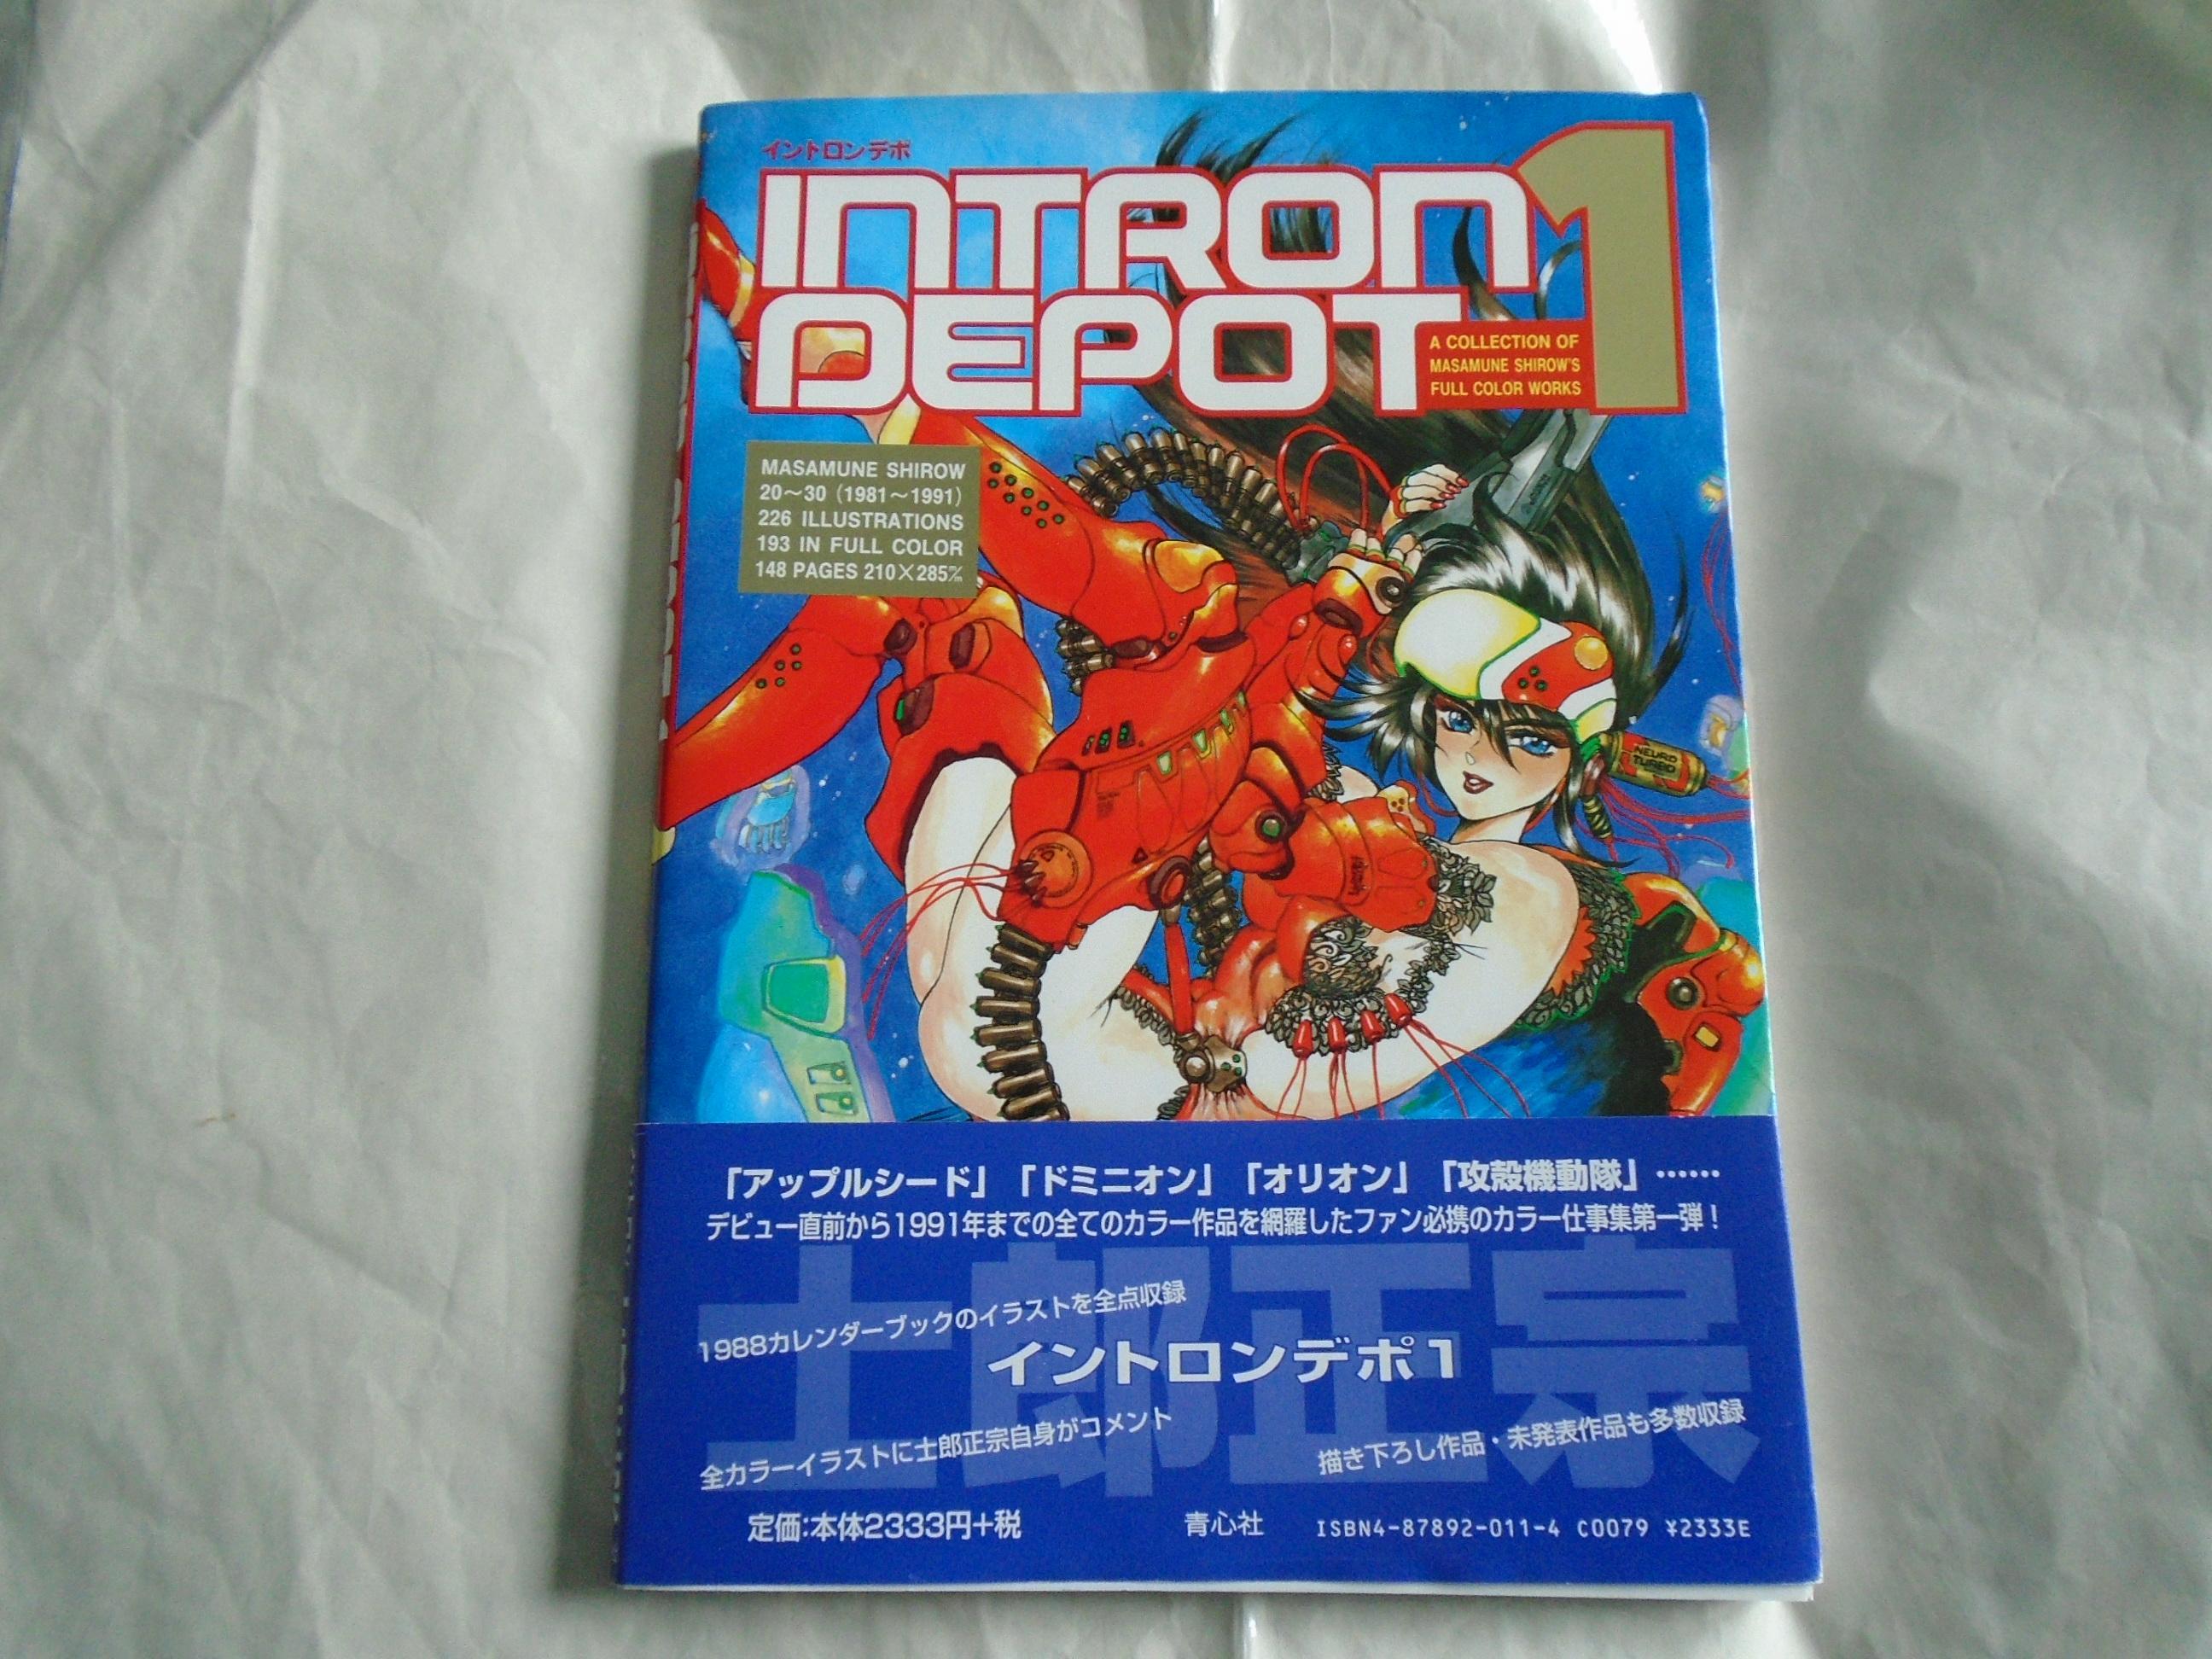 Intron depot 1 Japanese Book Japan Masamune Shirow ART BOOK